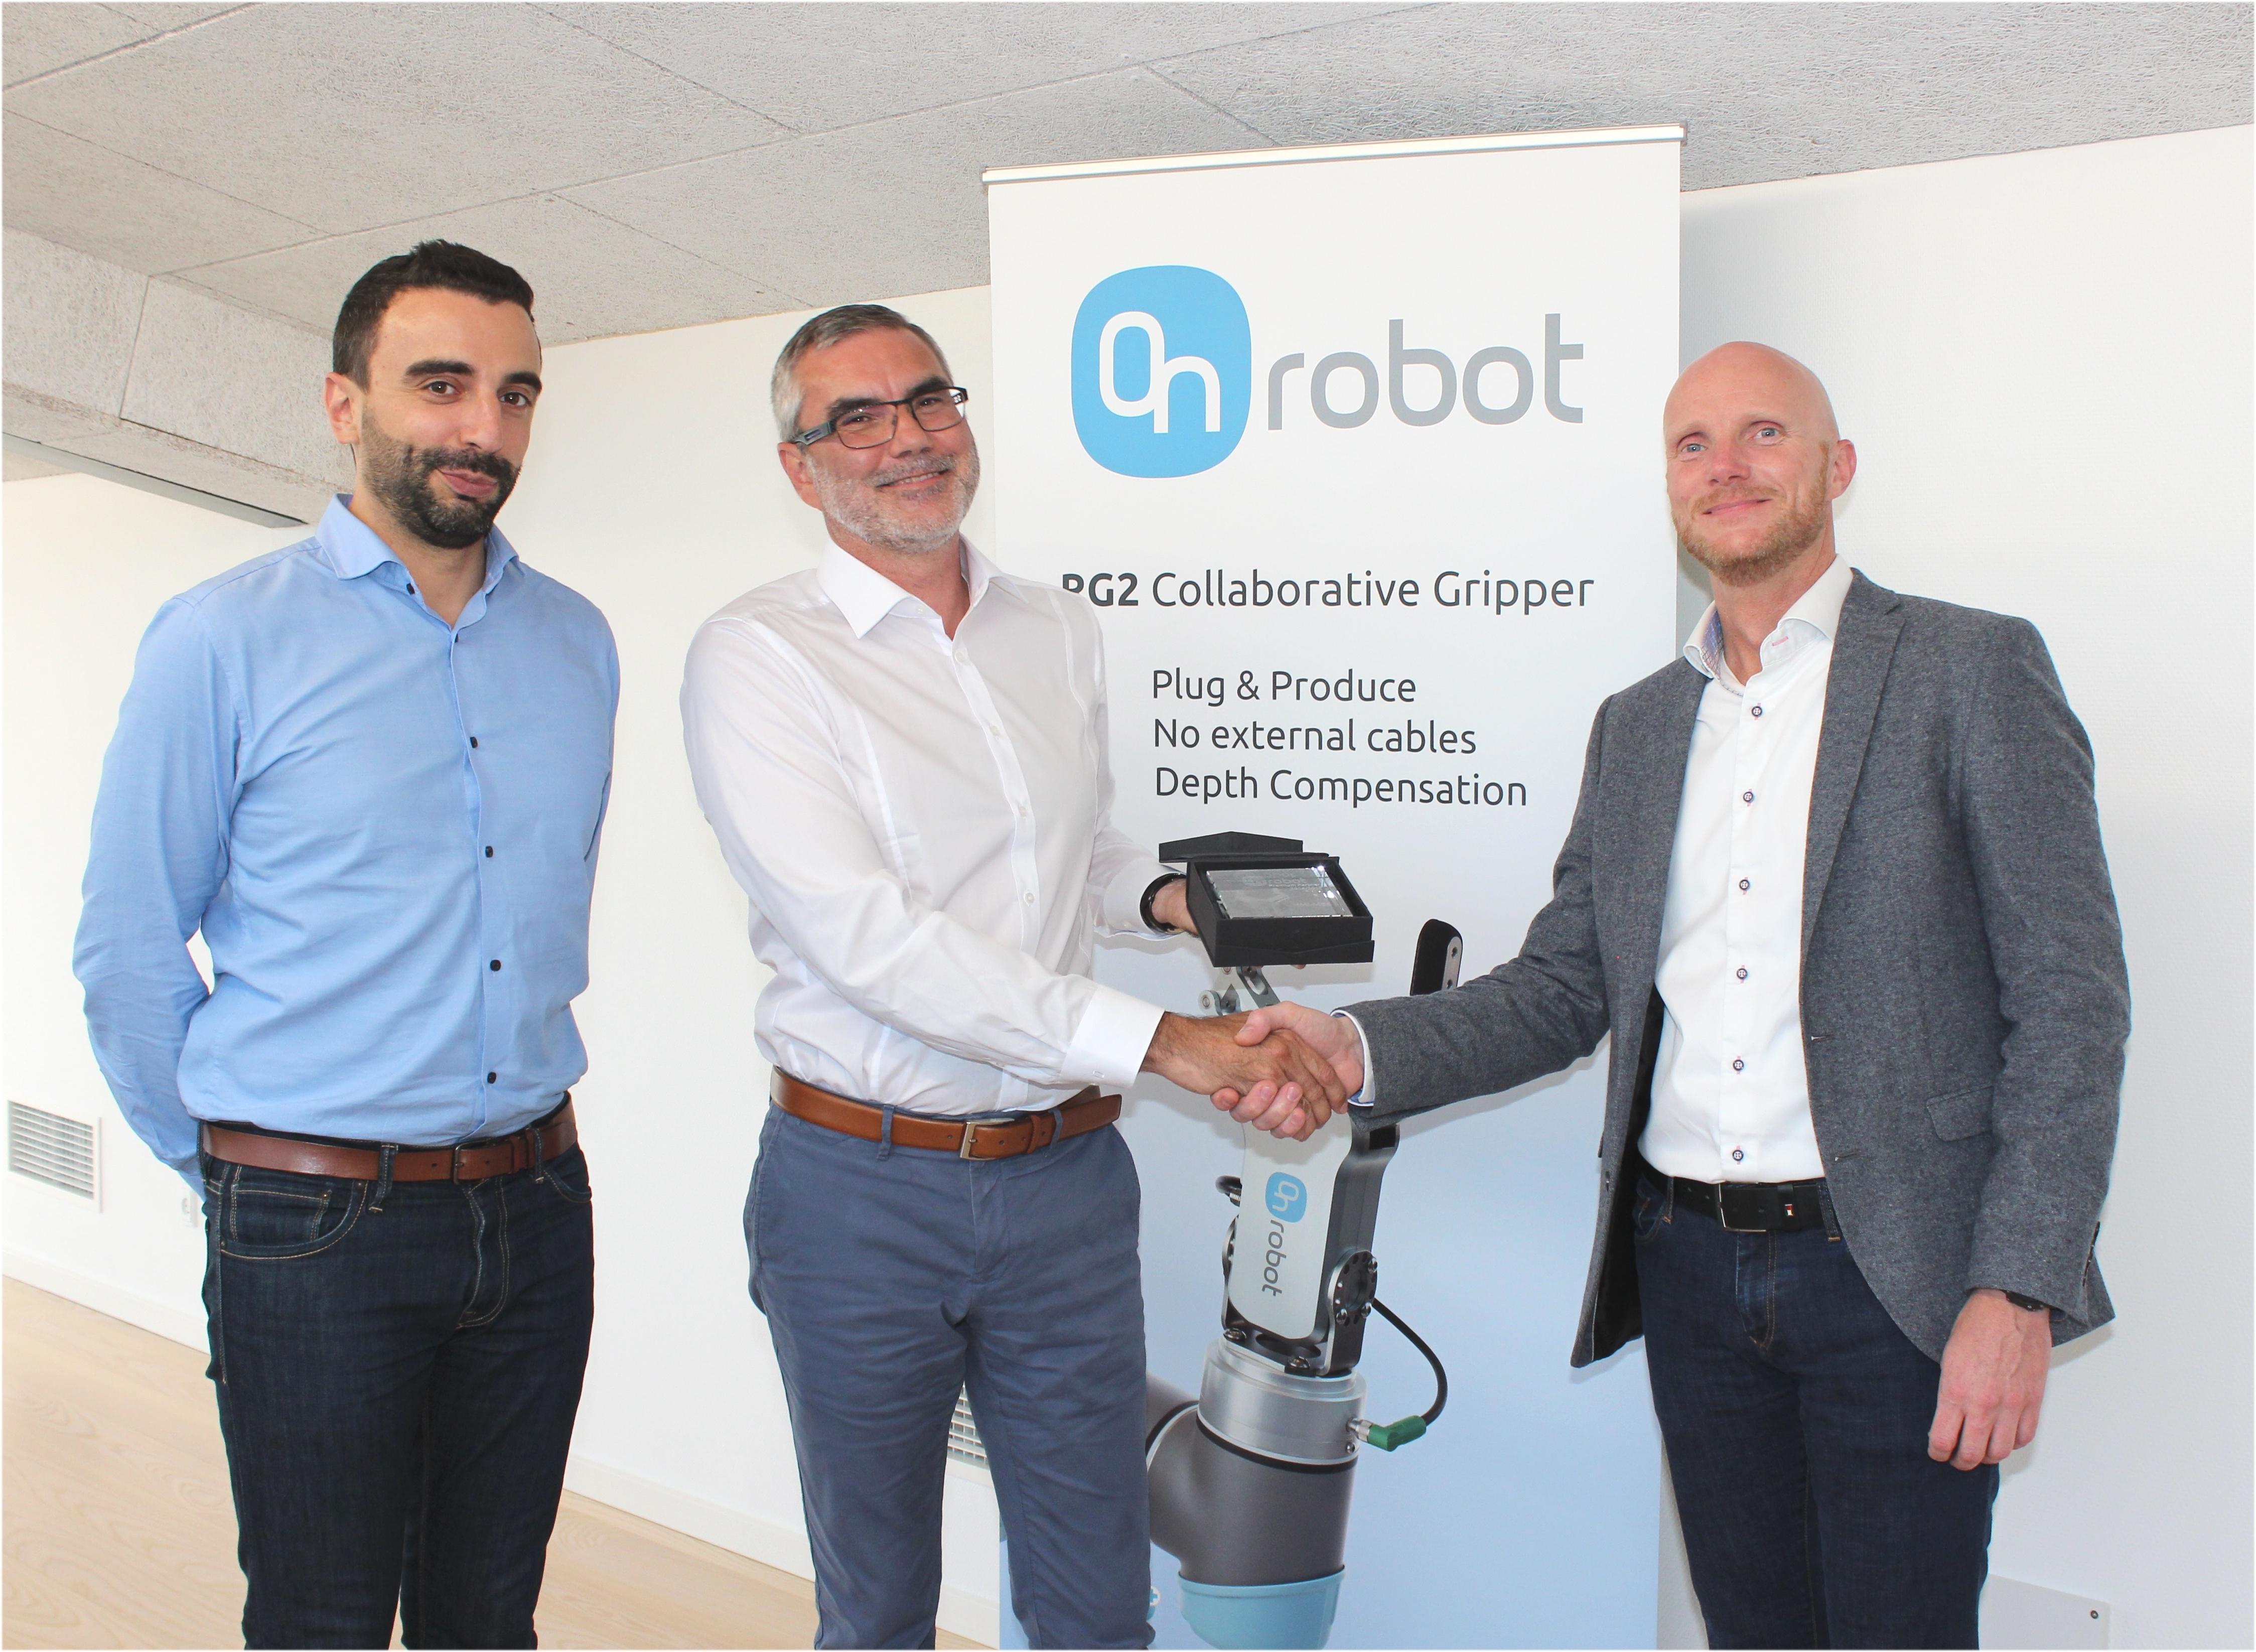 HMi-MBS : Premium Partner On Robot